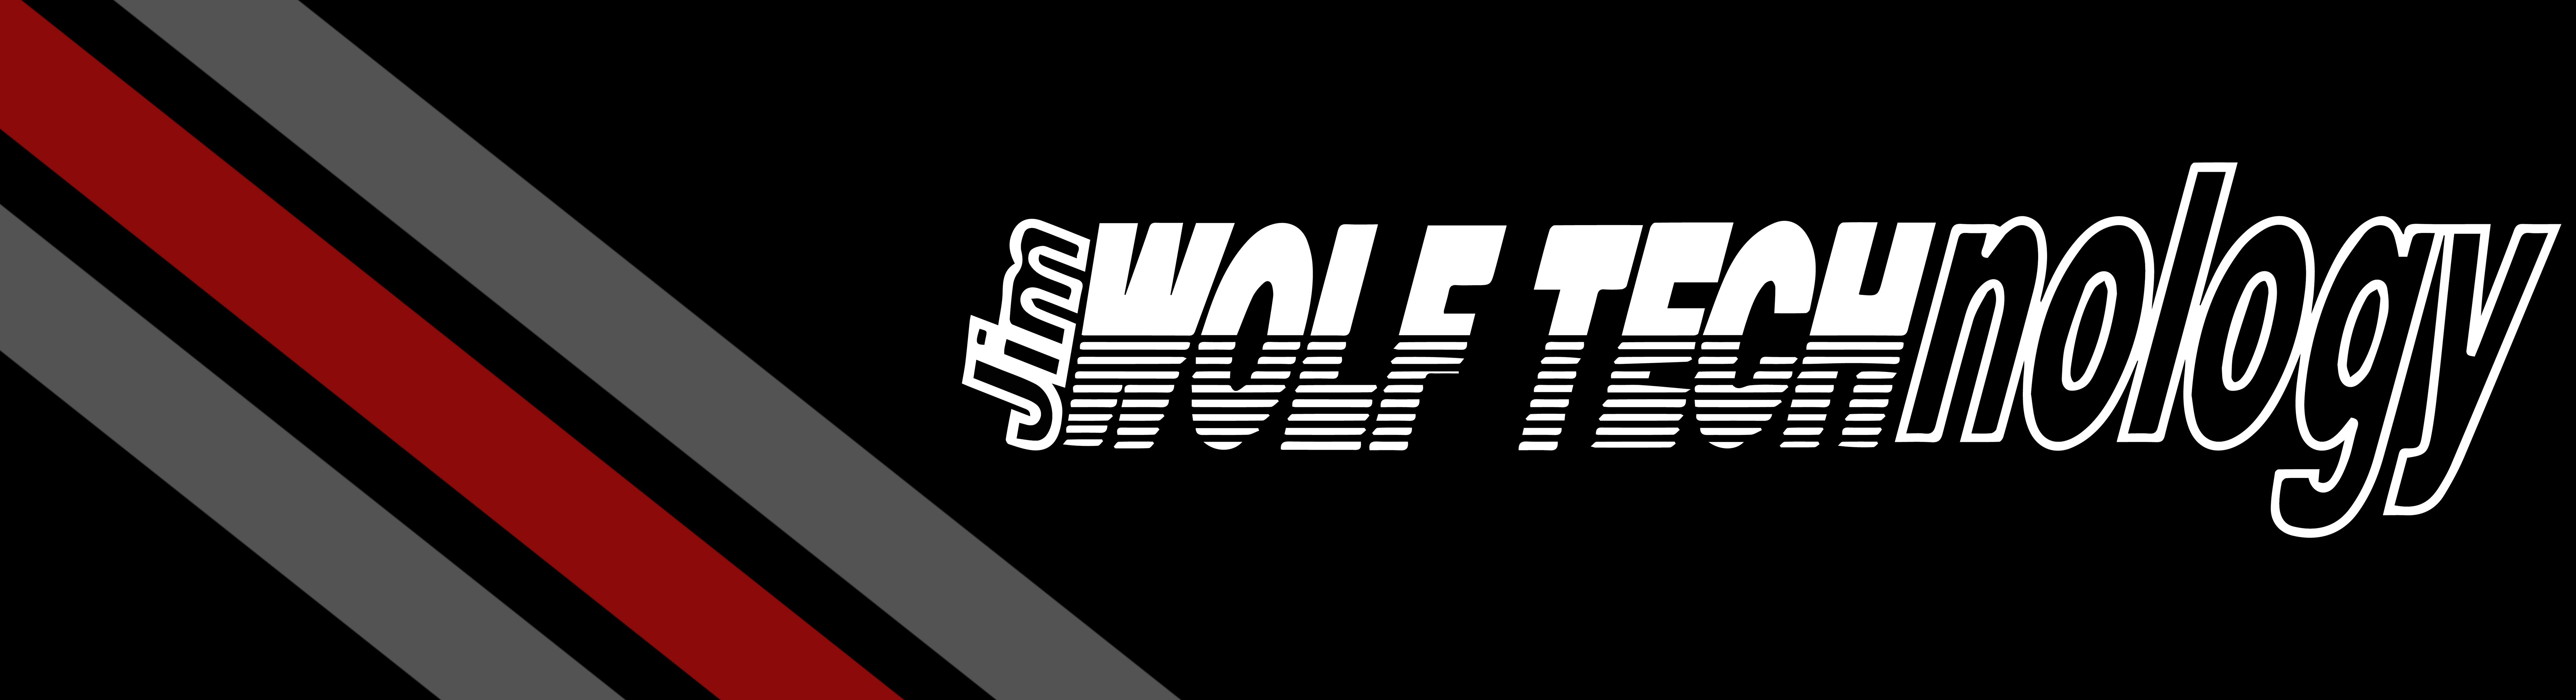 Jim Wolf Technology JWT - Concept Z Performance